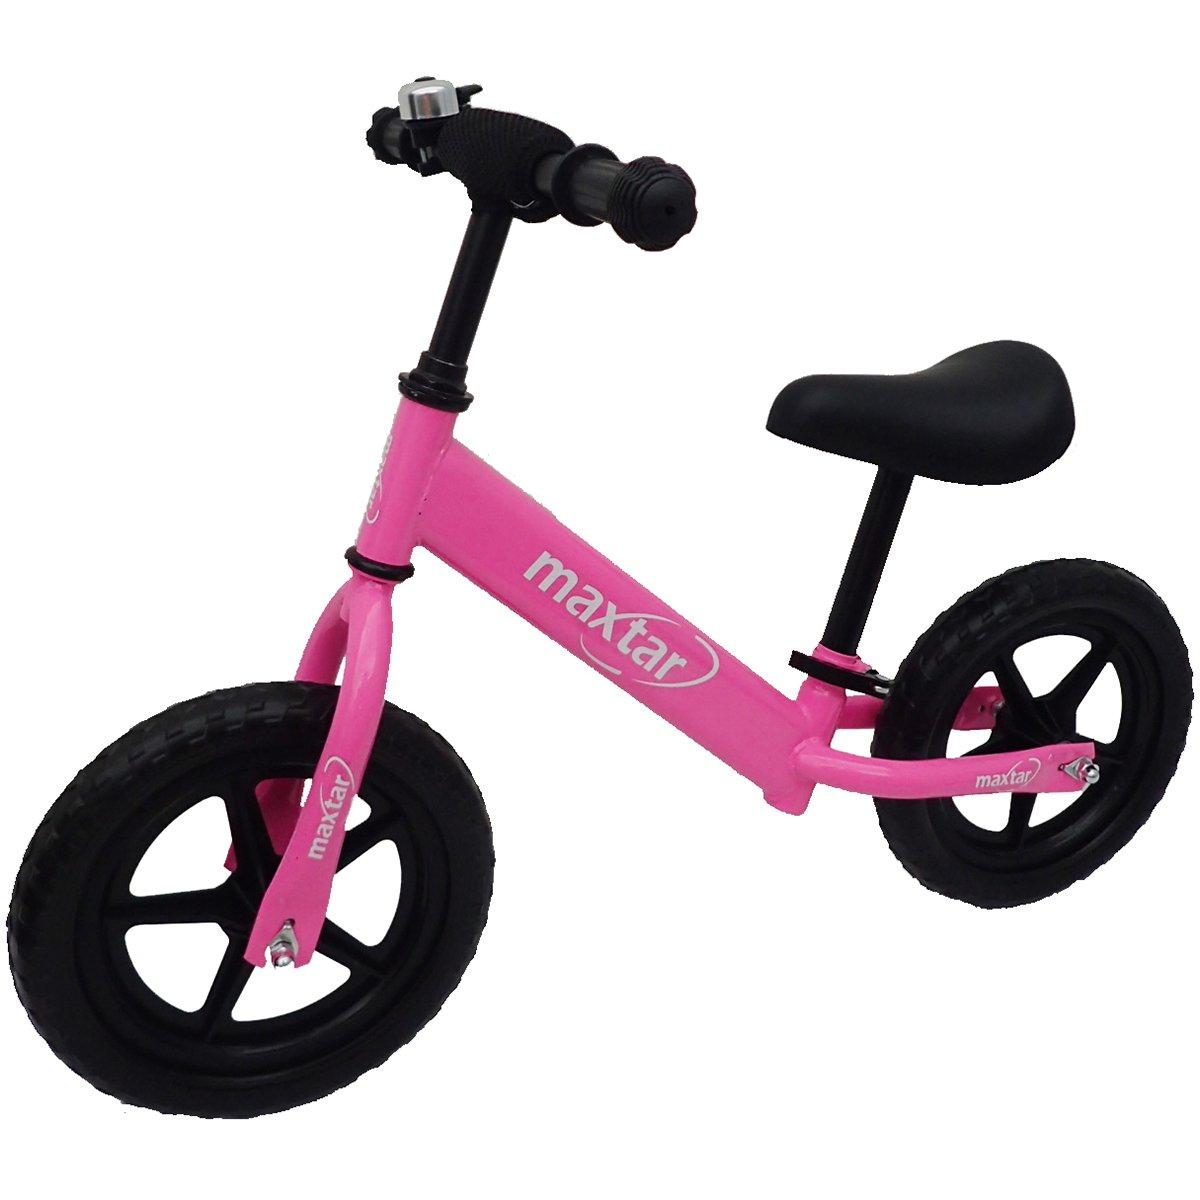 Bicicleta fara pedale Maxtar Sebra, Roz, 12 inch